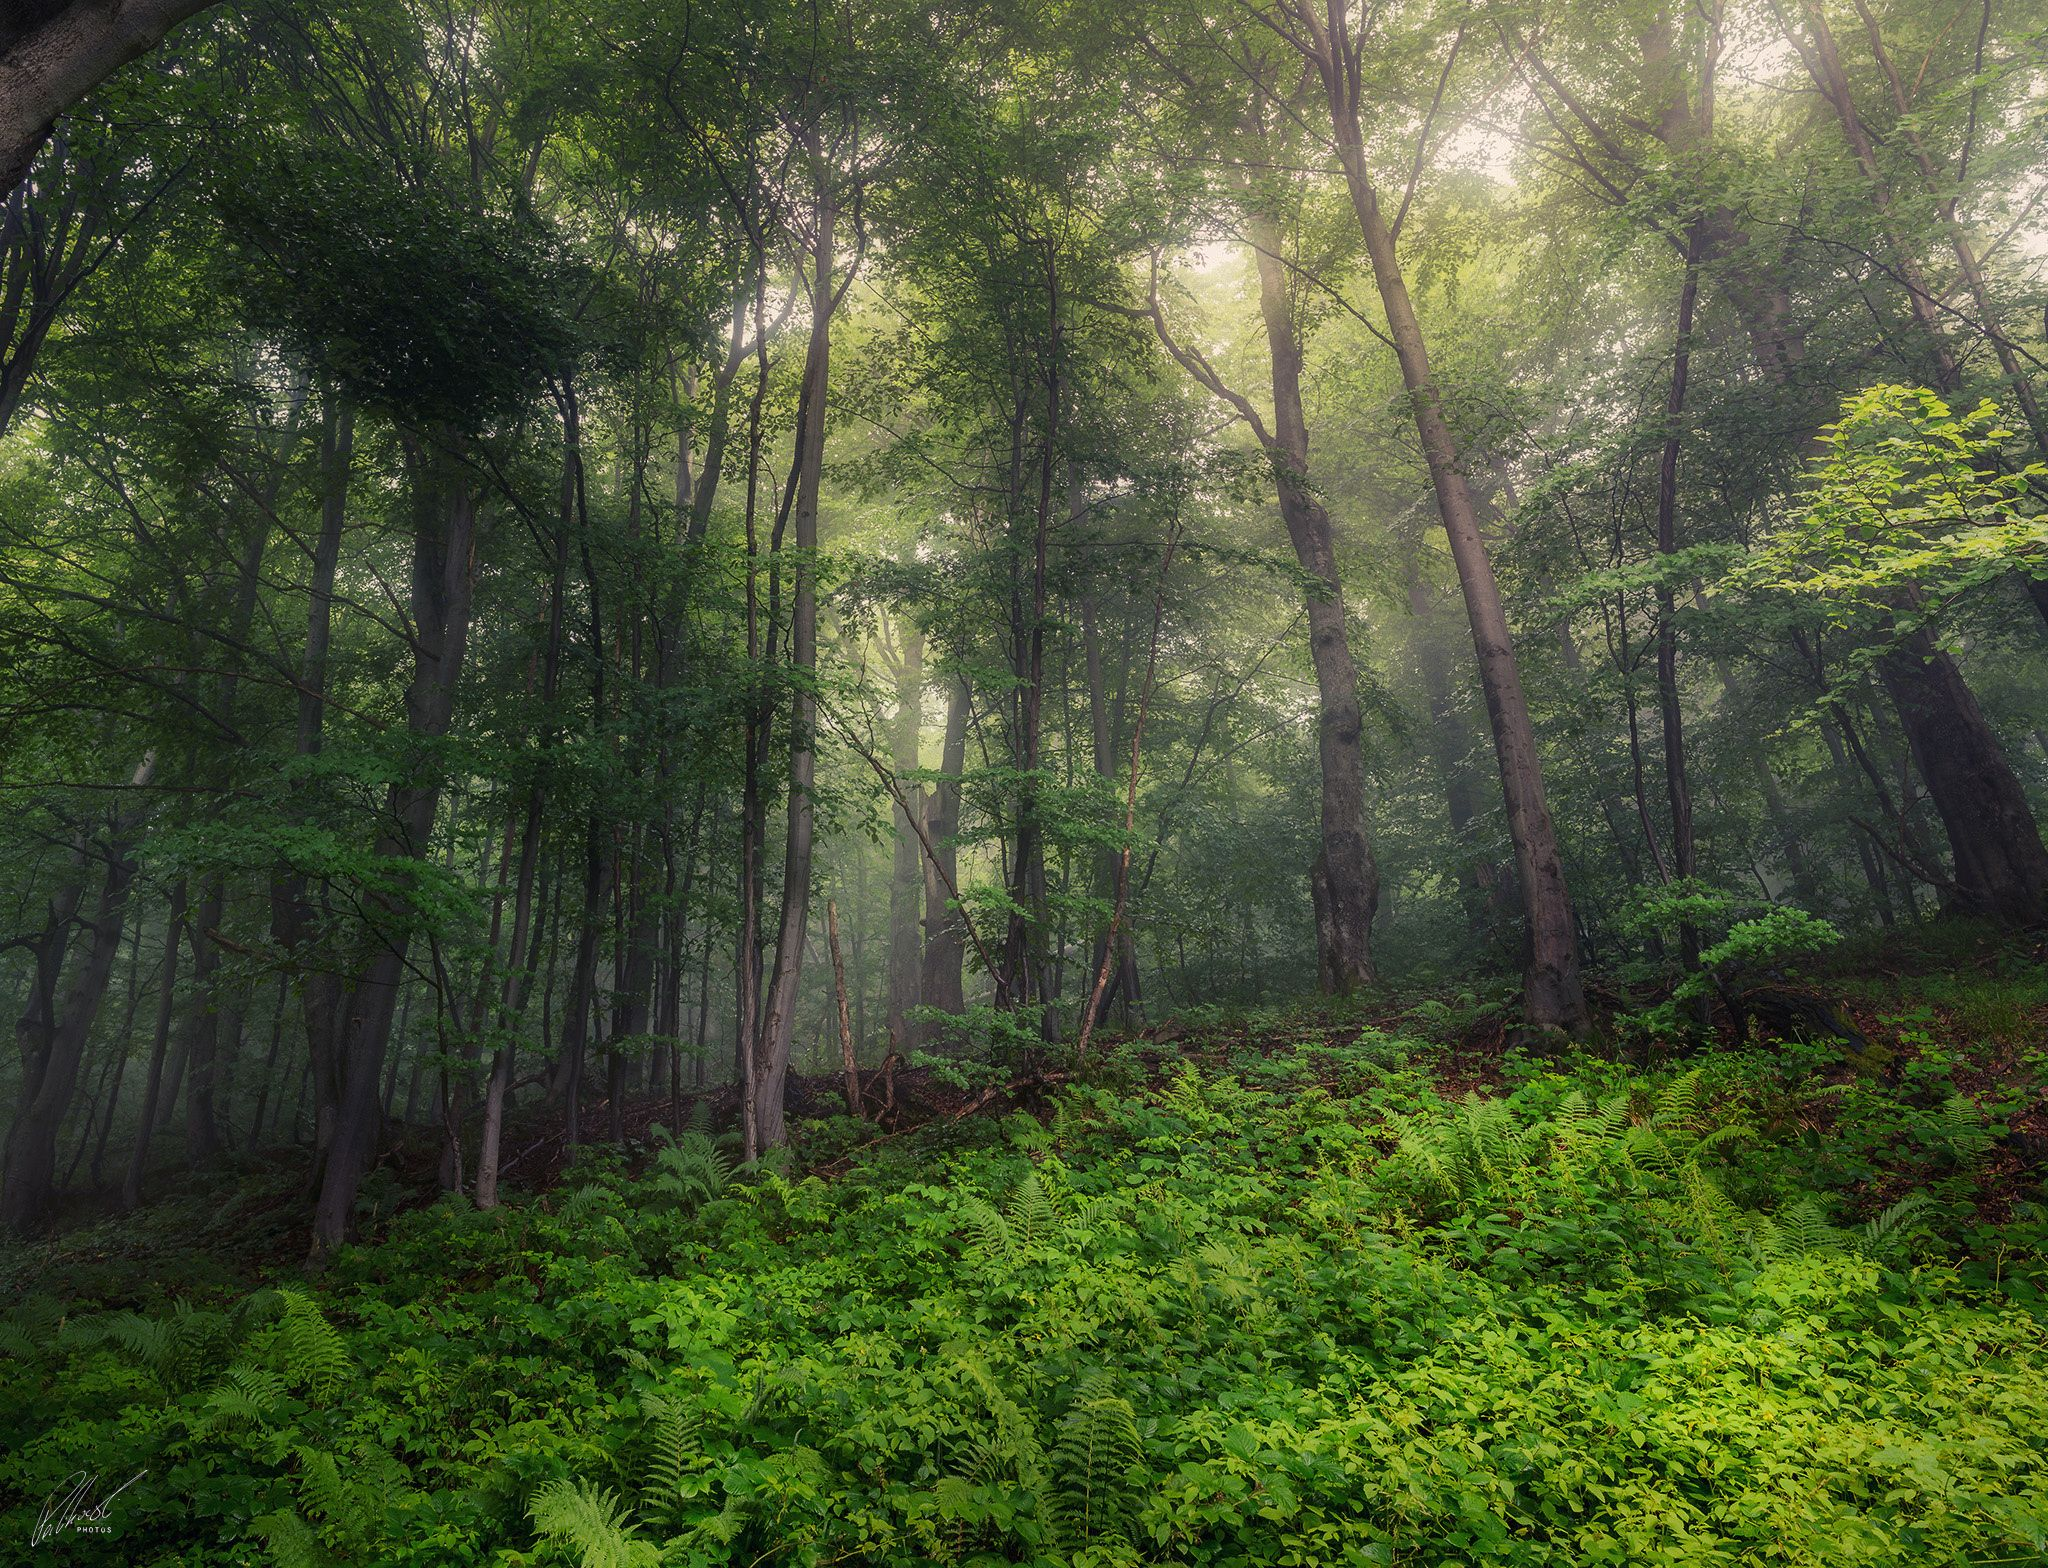 Misty Forest by Jakub Perlikowski on 500px